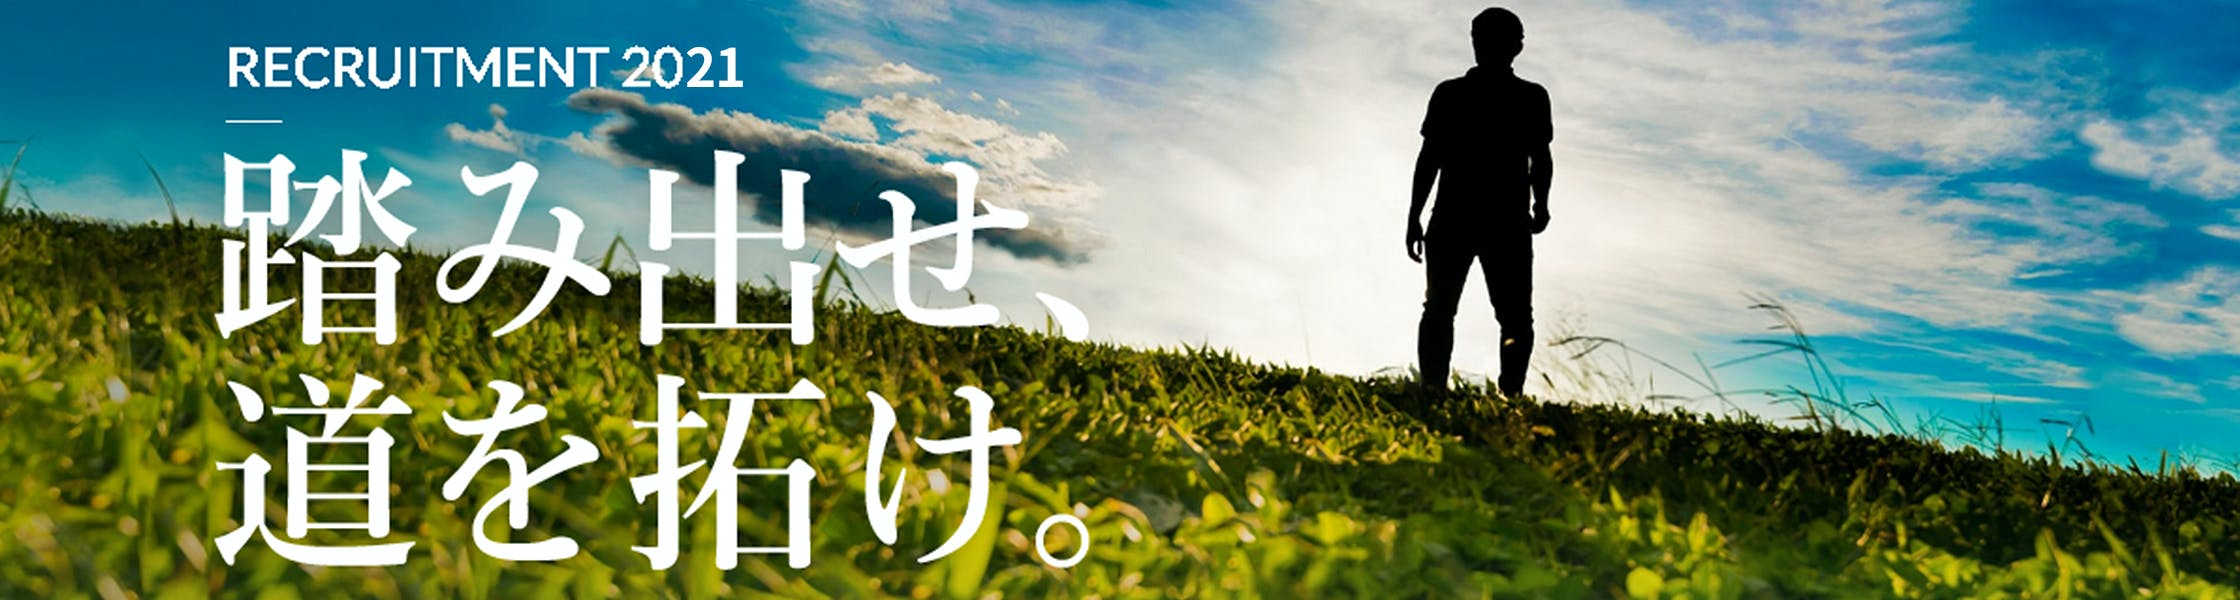 1556087595 fujifilm 1120x300 2x 2.jpg?ixlib=rails 3.0